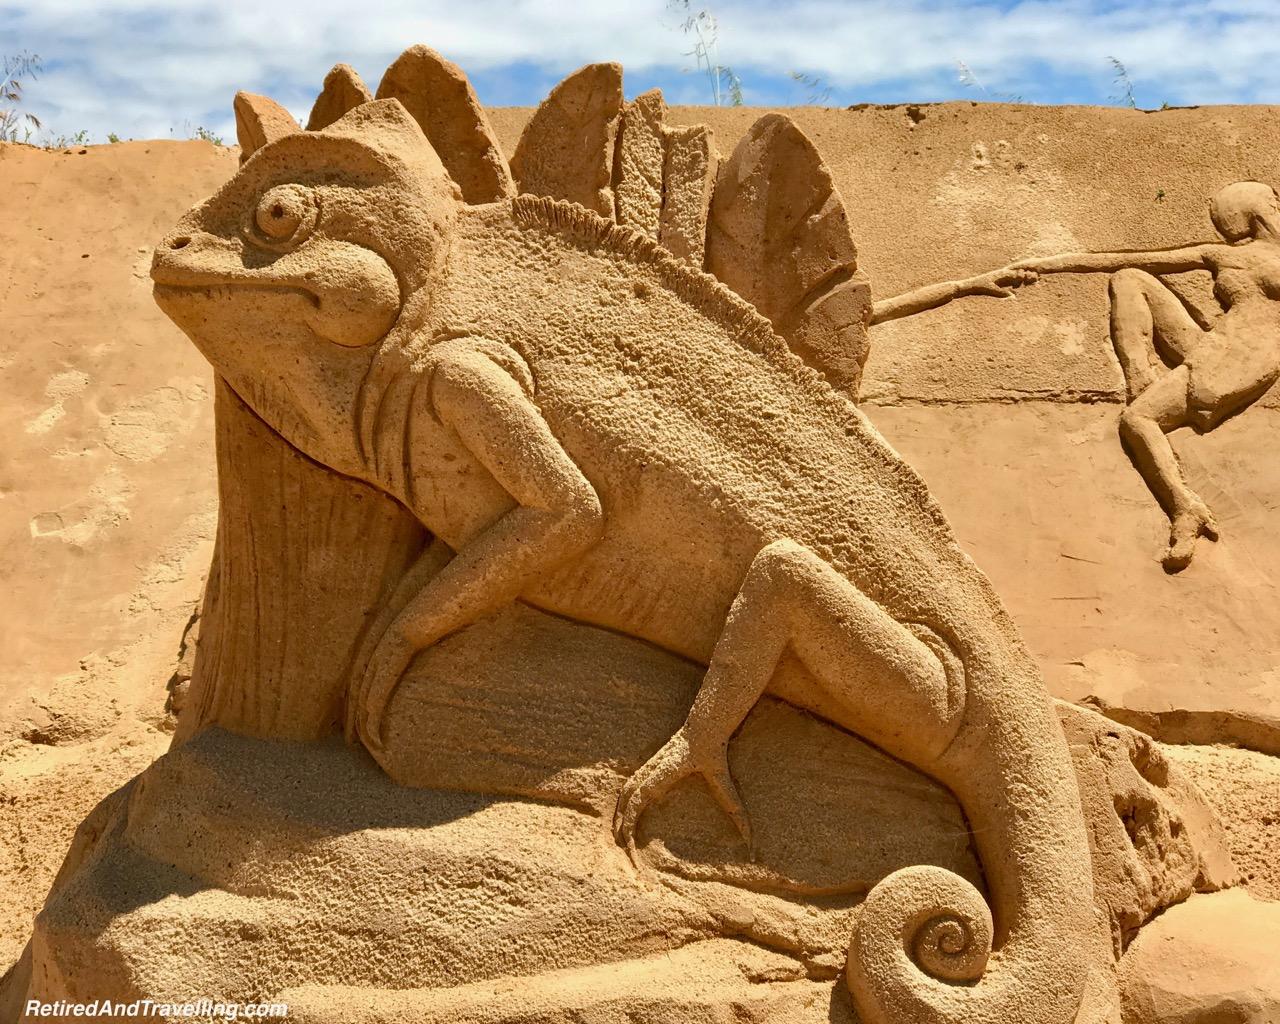 Chameleon Sand Sculpture - Sand City Algarve.jpg